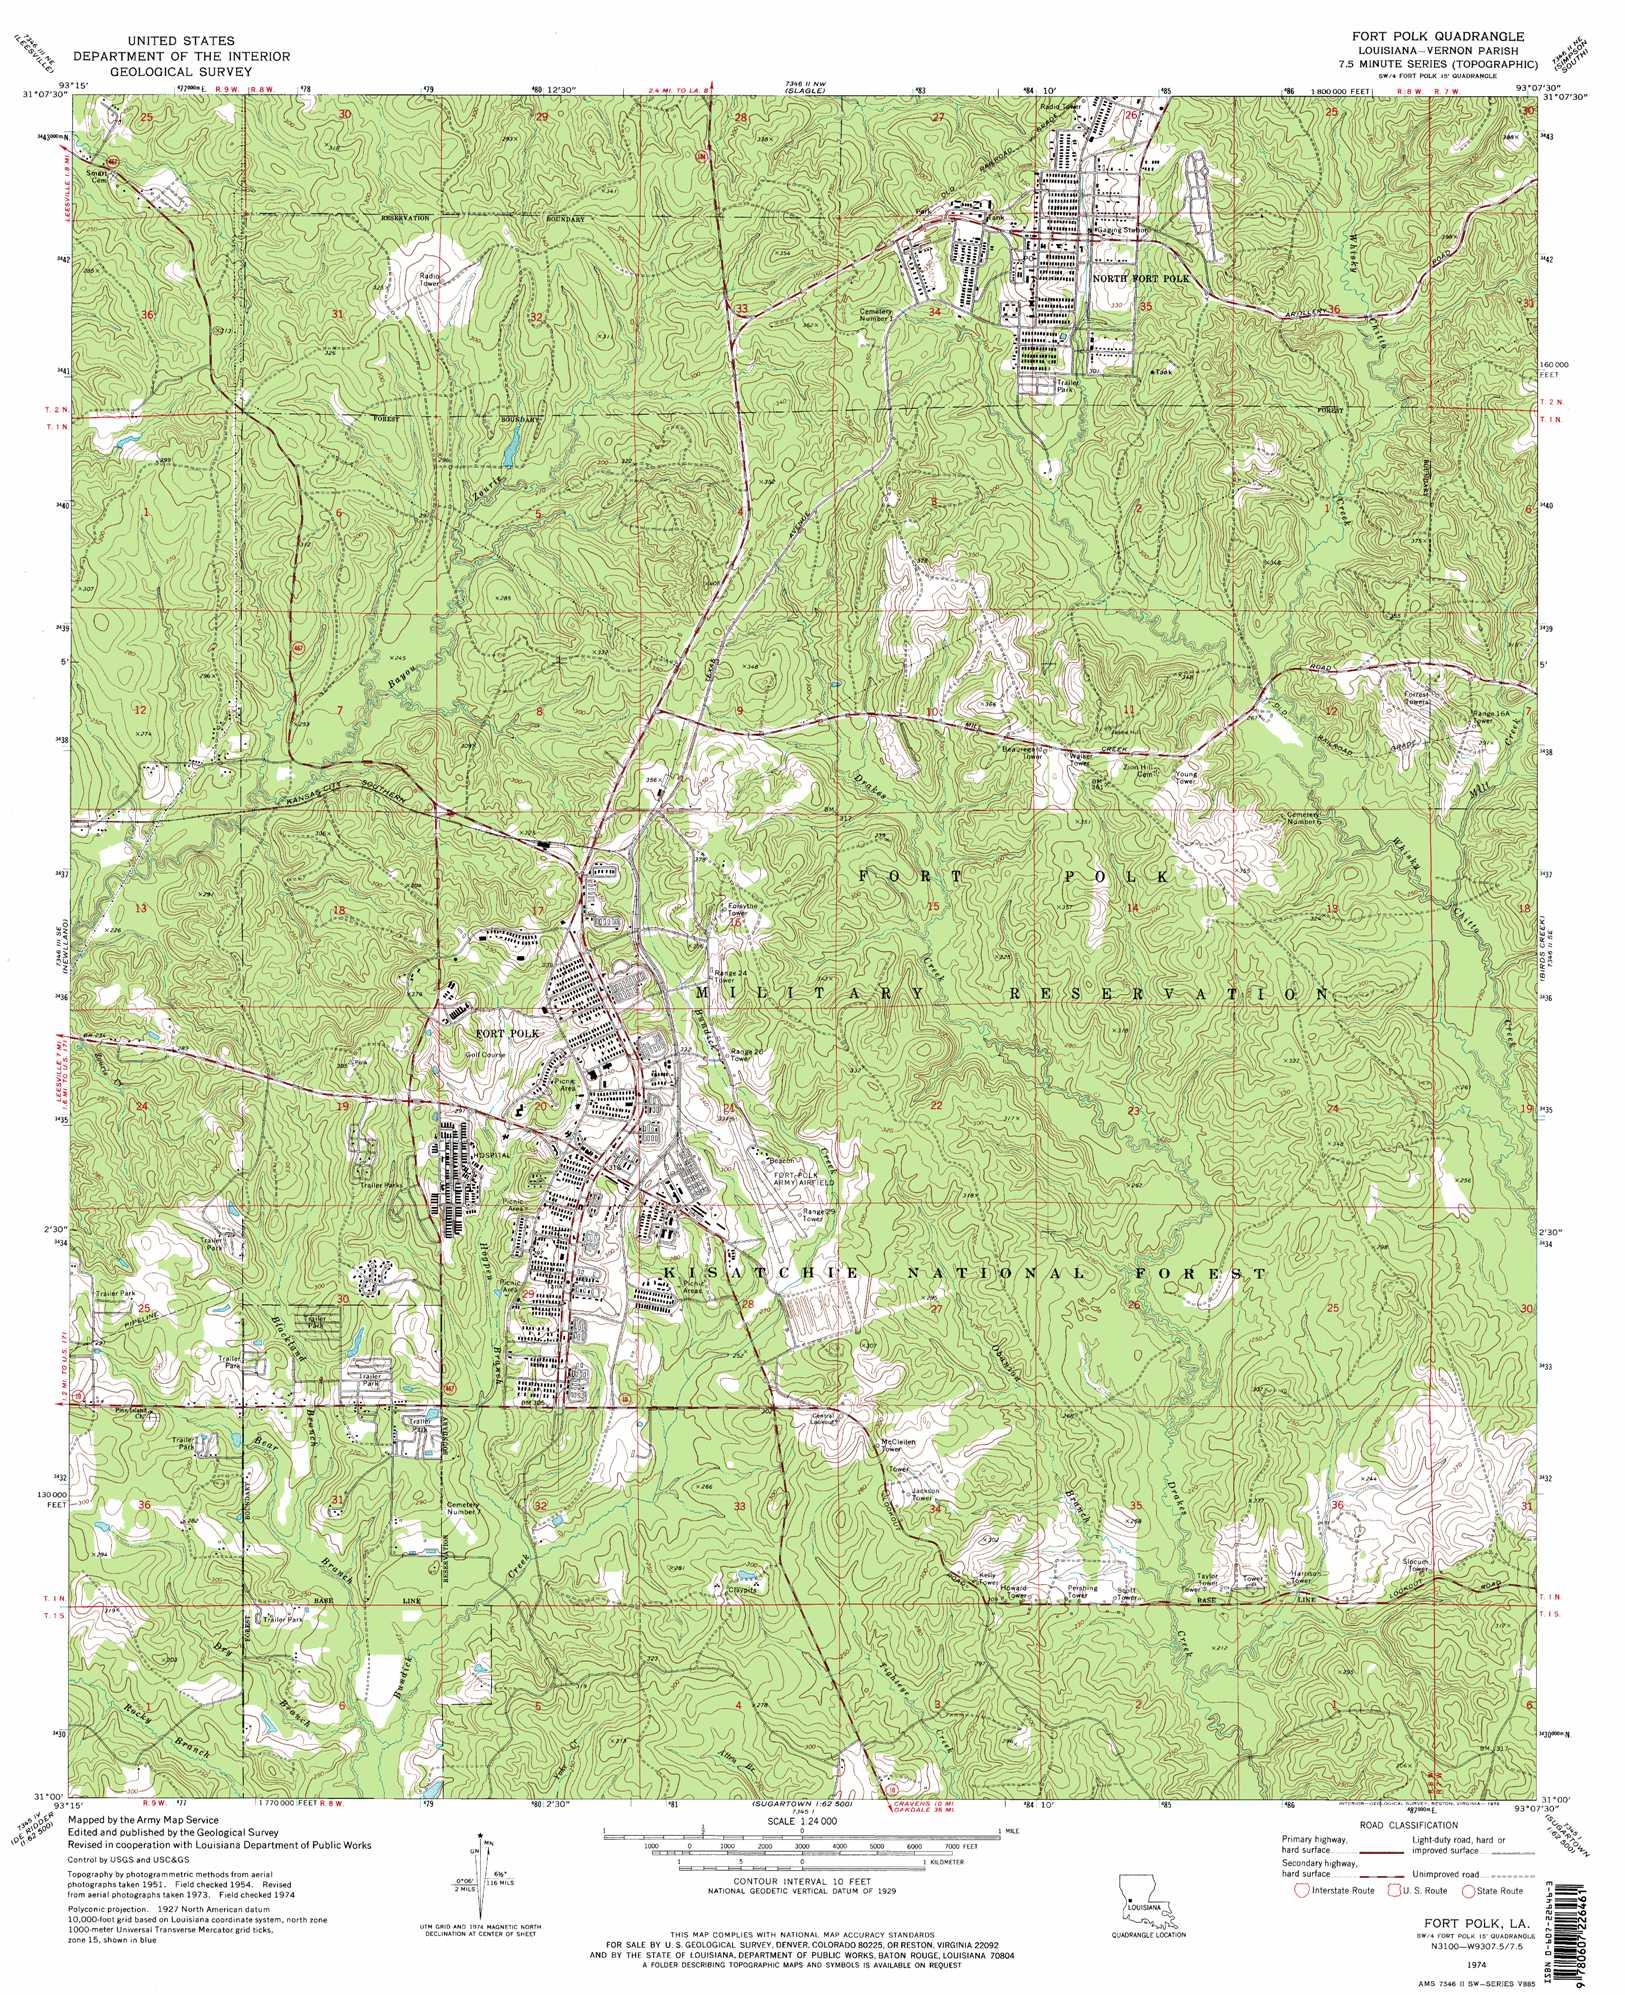 fort polk topographic map la  usgs topo quad a - fort polk